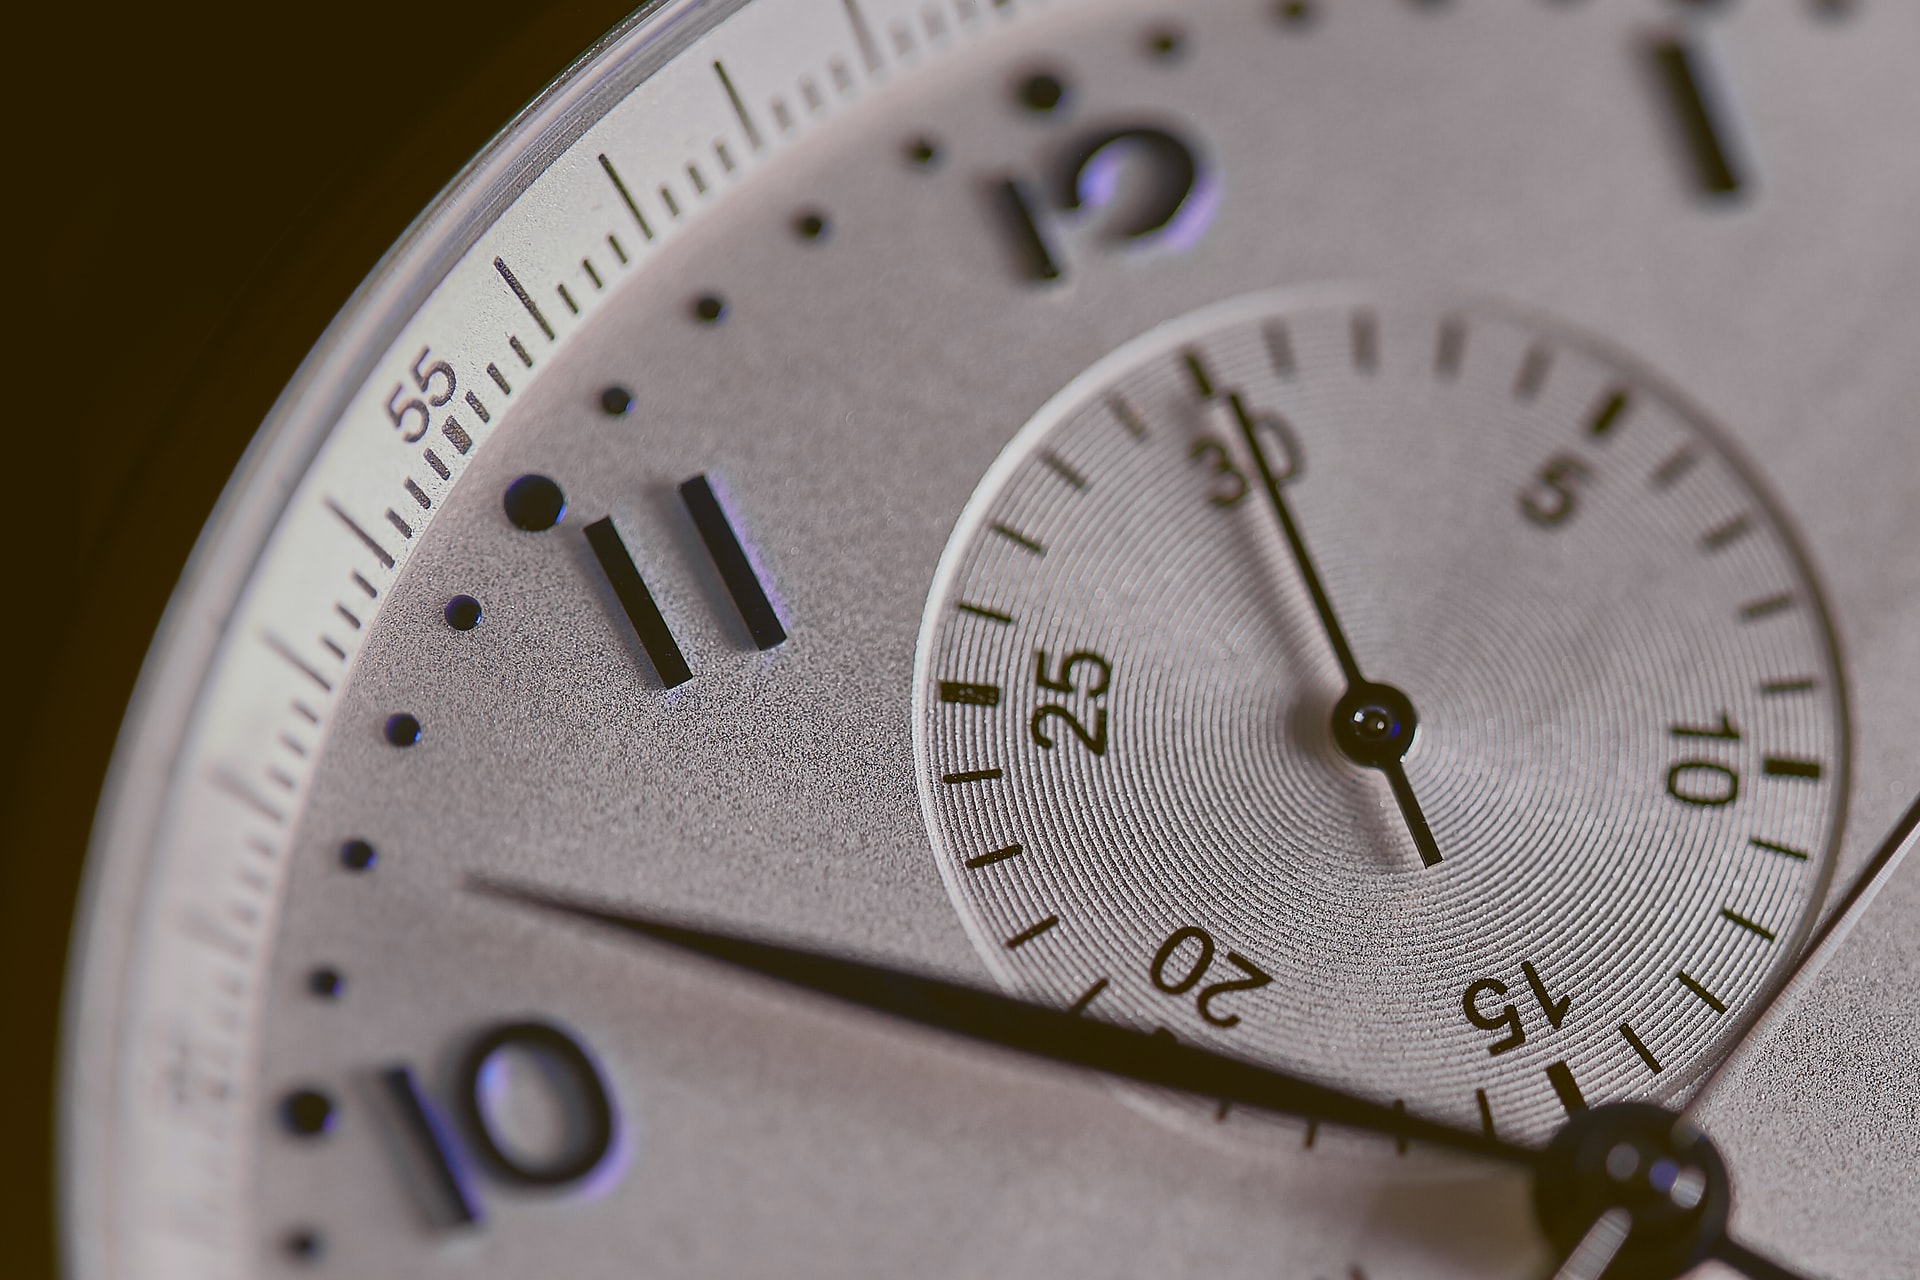 A close-up shot of a clock face